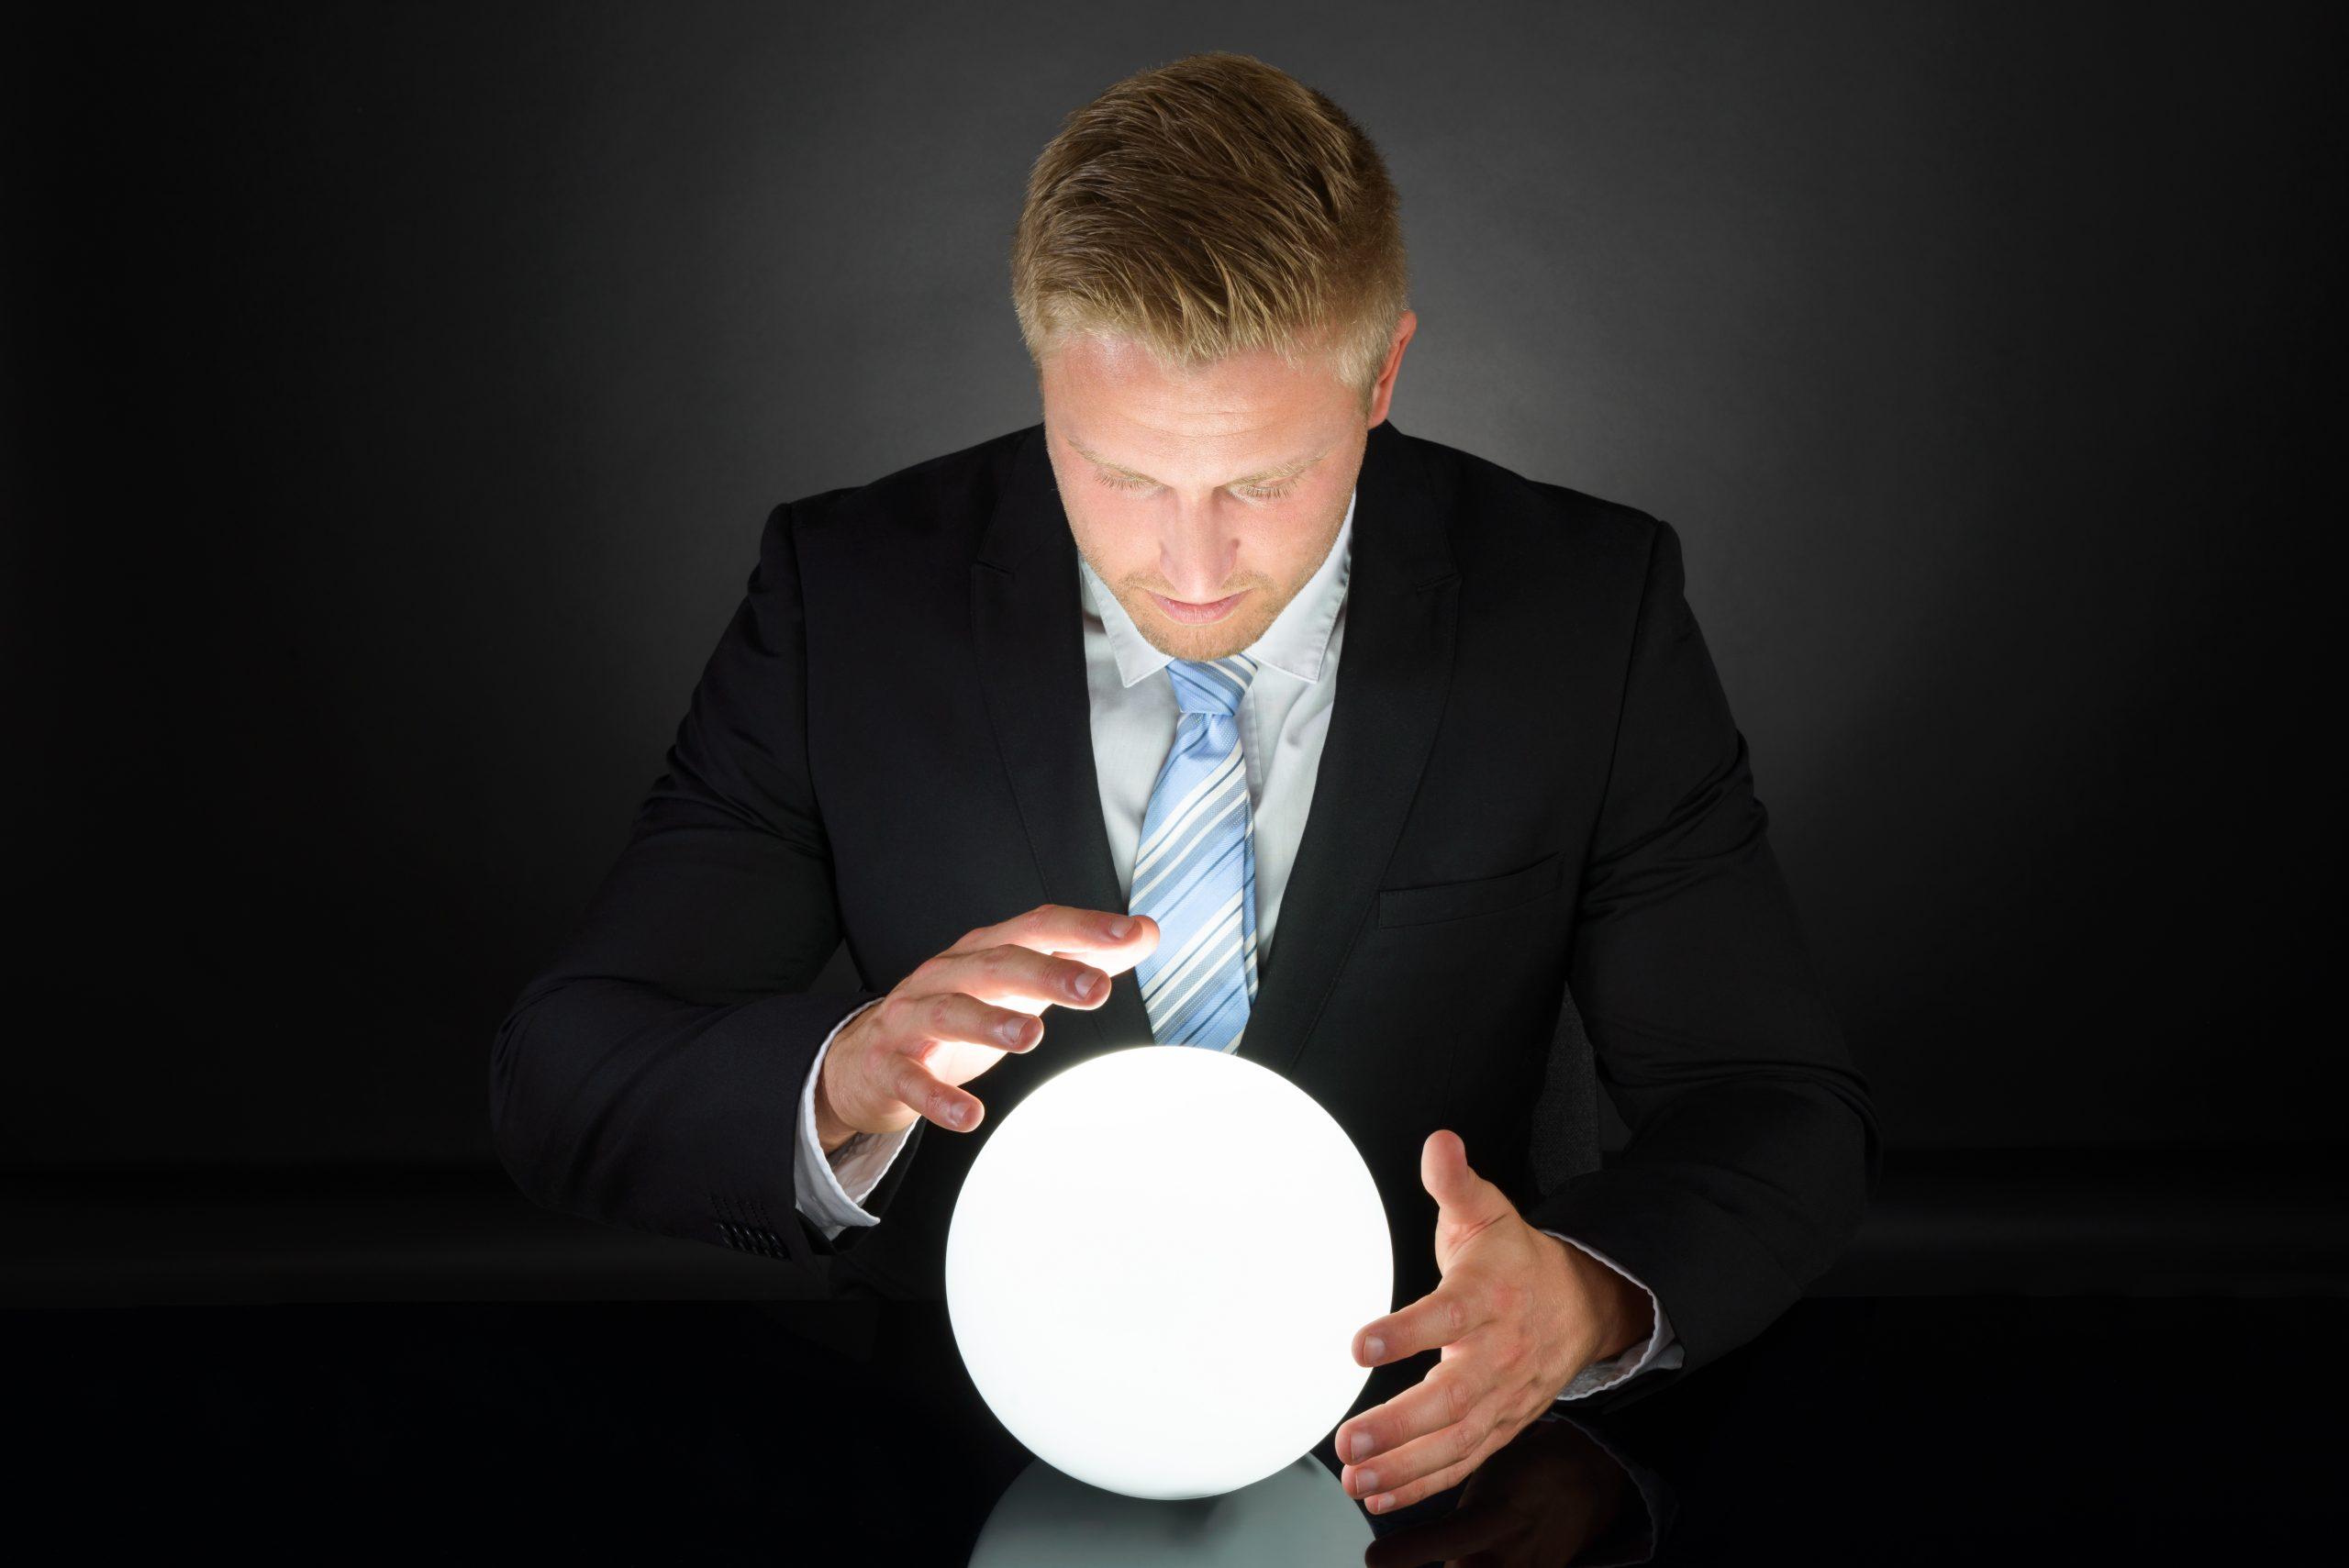 https://depositphotos.com/63324165/stock-photo-businessman-with-crystal-ball.html